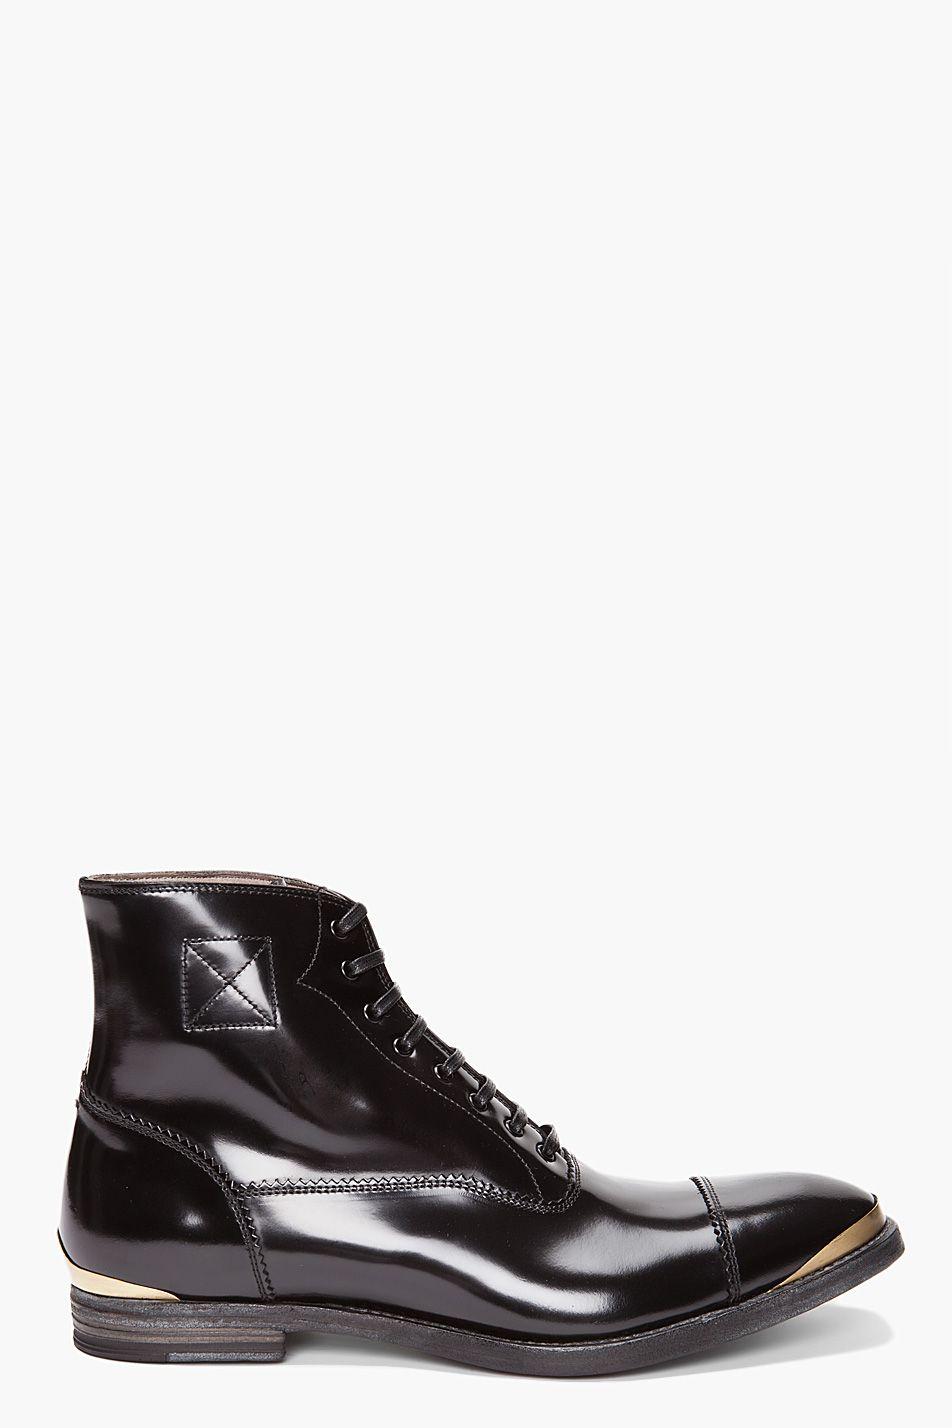 Alexander Mcqueen lace-up boots for Men 0539160a9392d